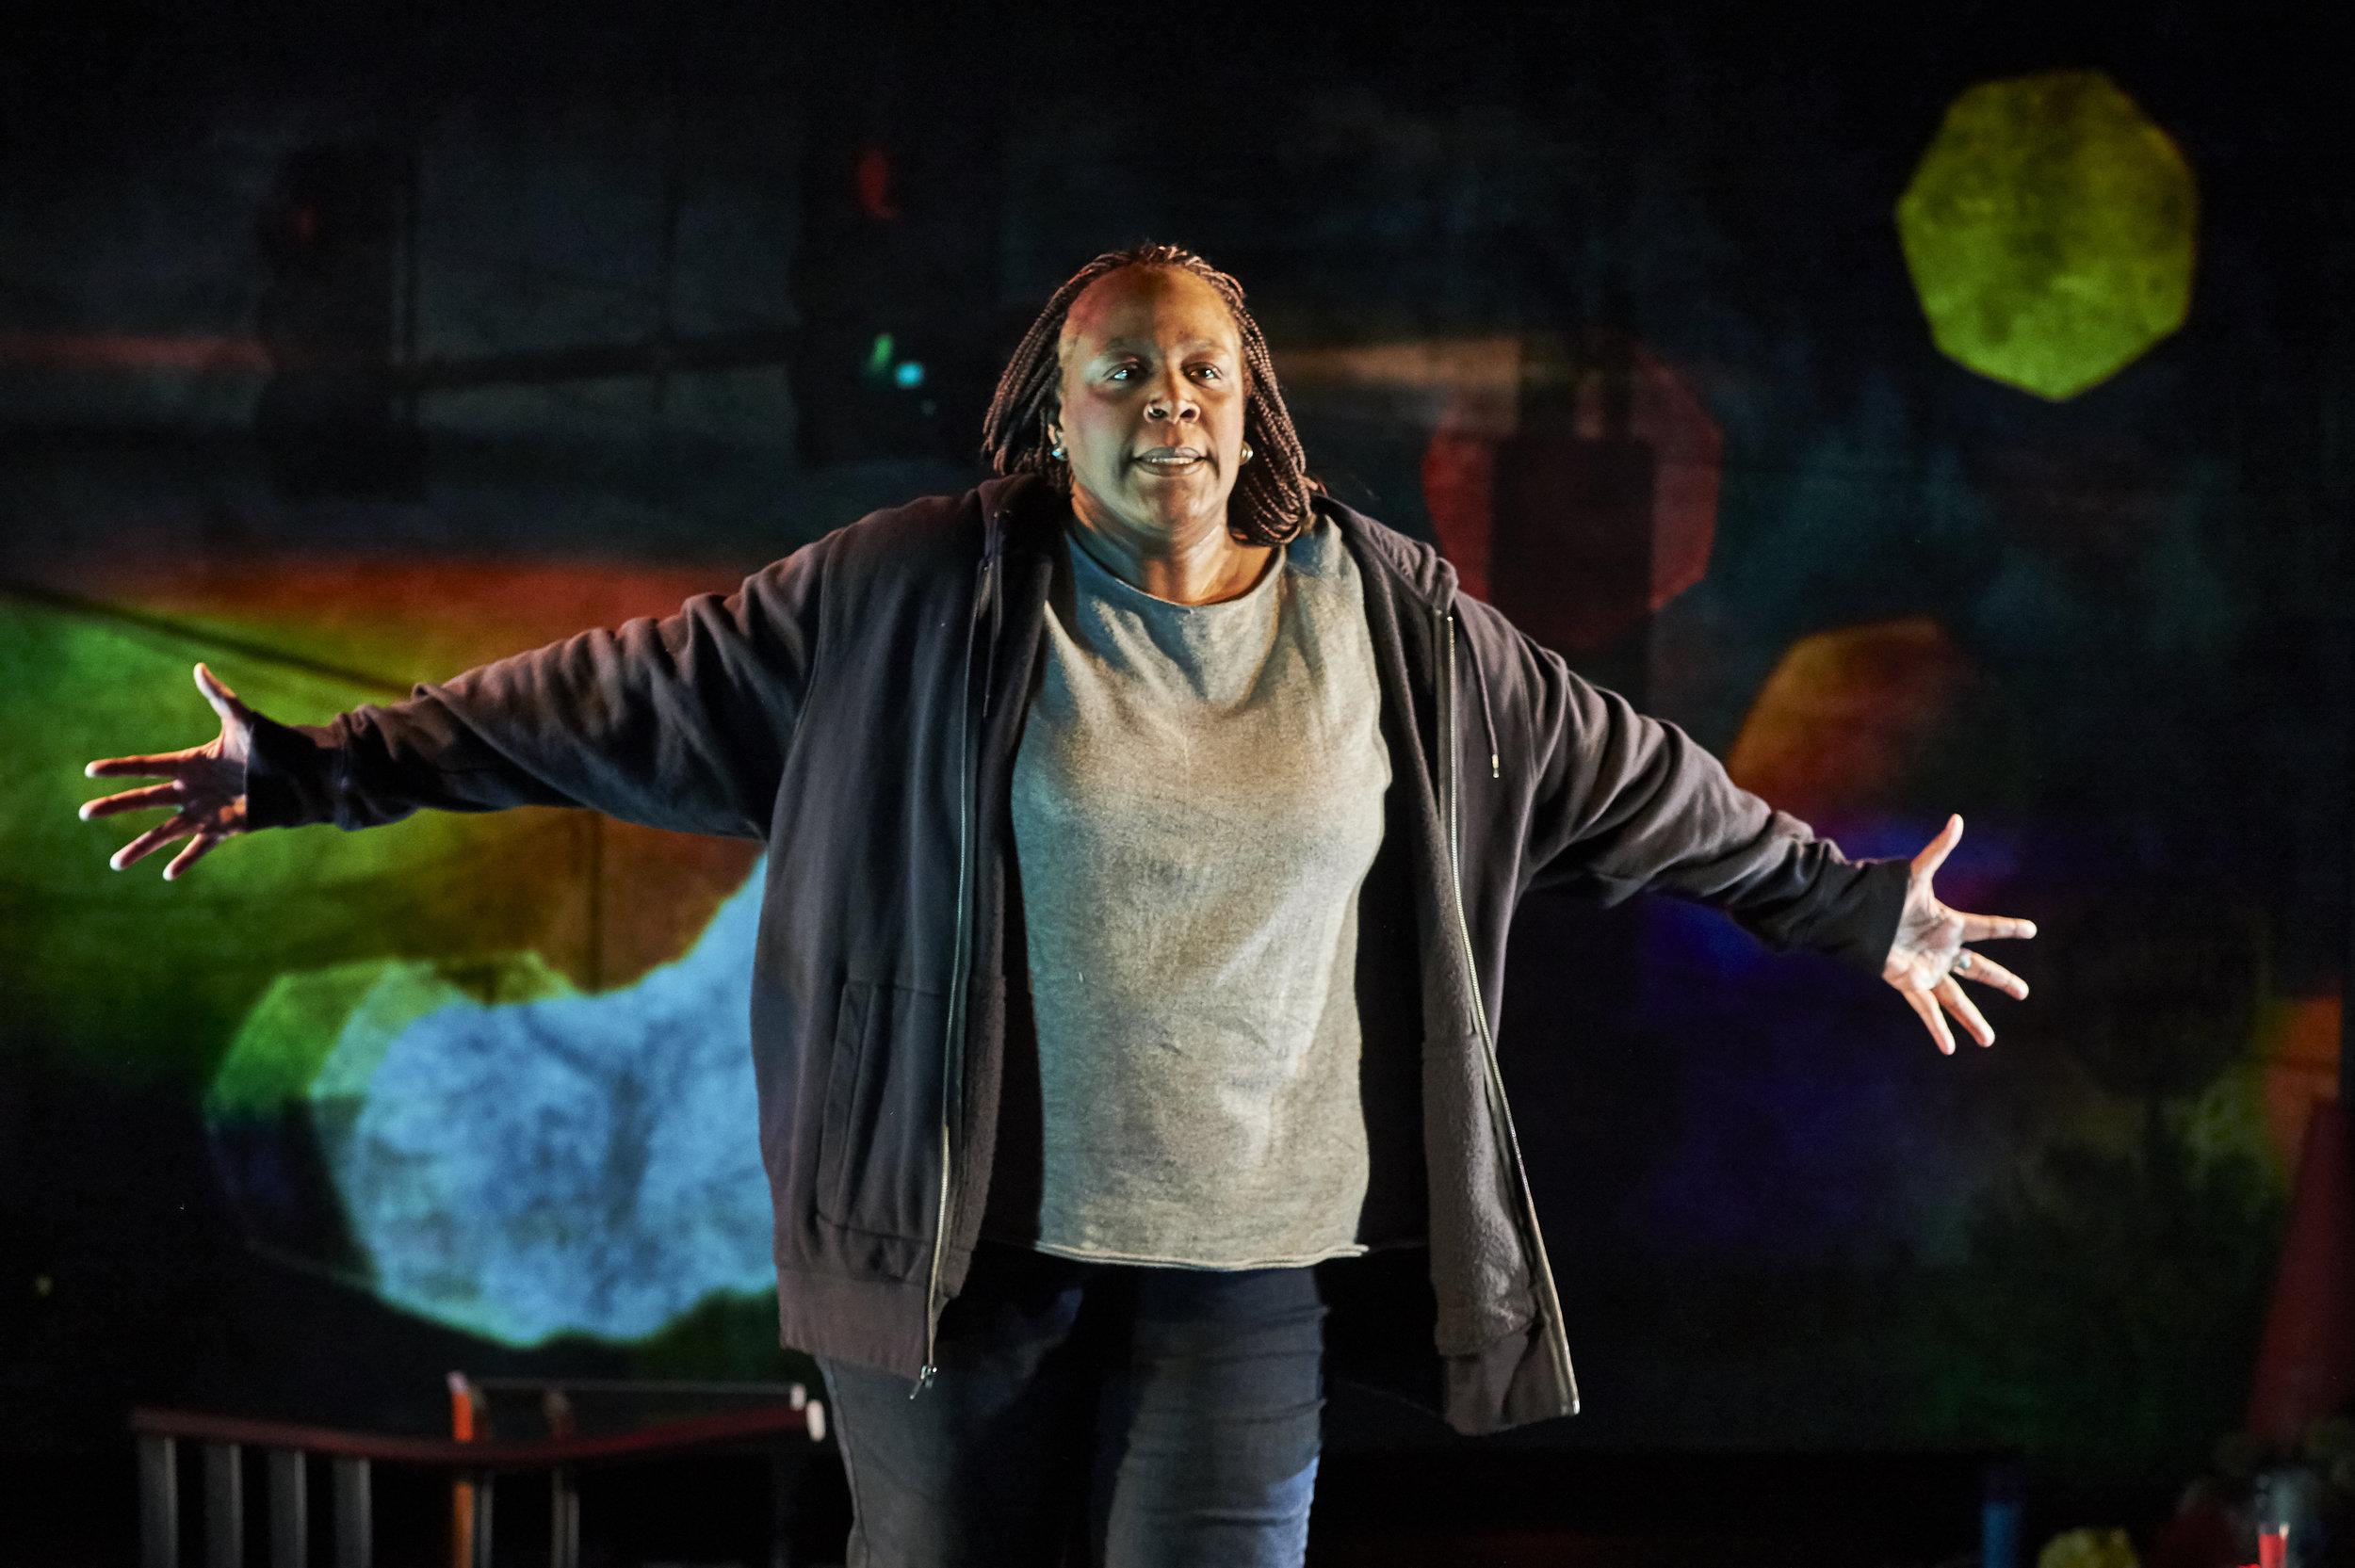 Photo: Robert Altman, courtesy of Rattlestick Playwrights Theater, 2018